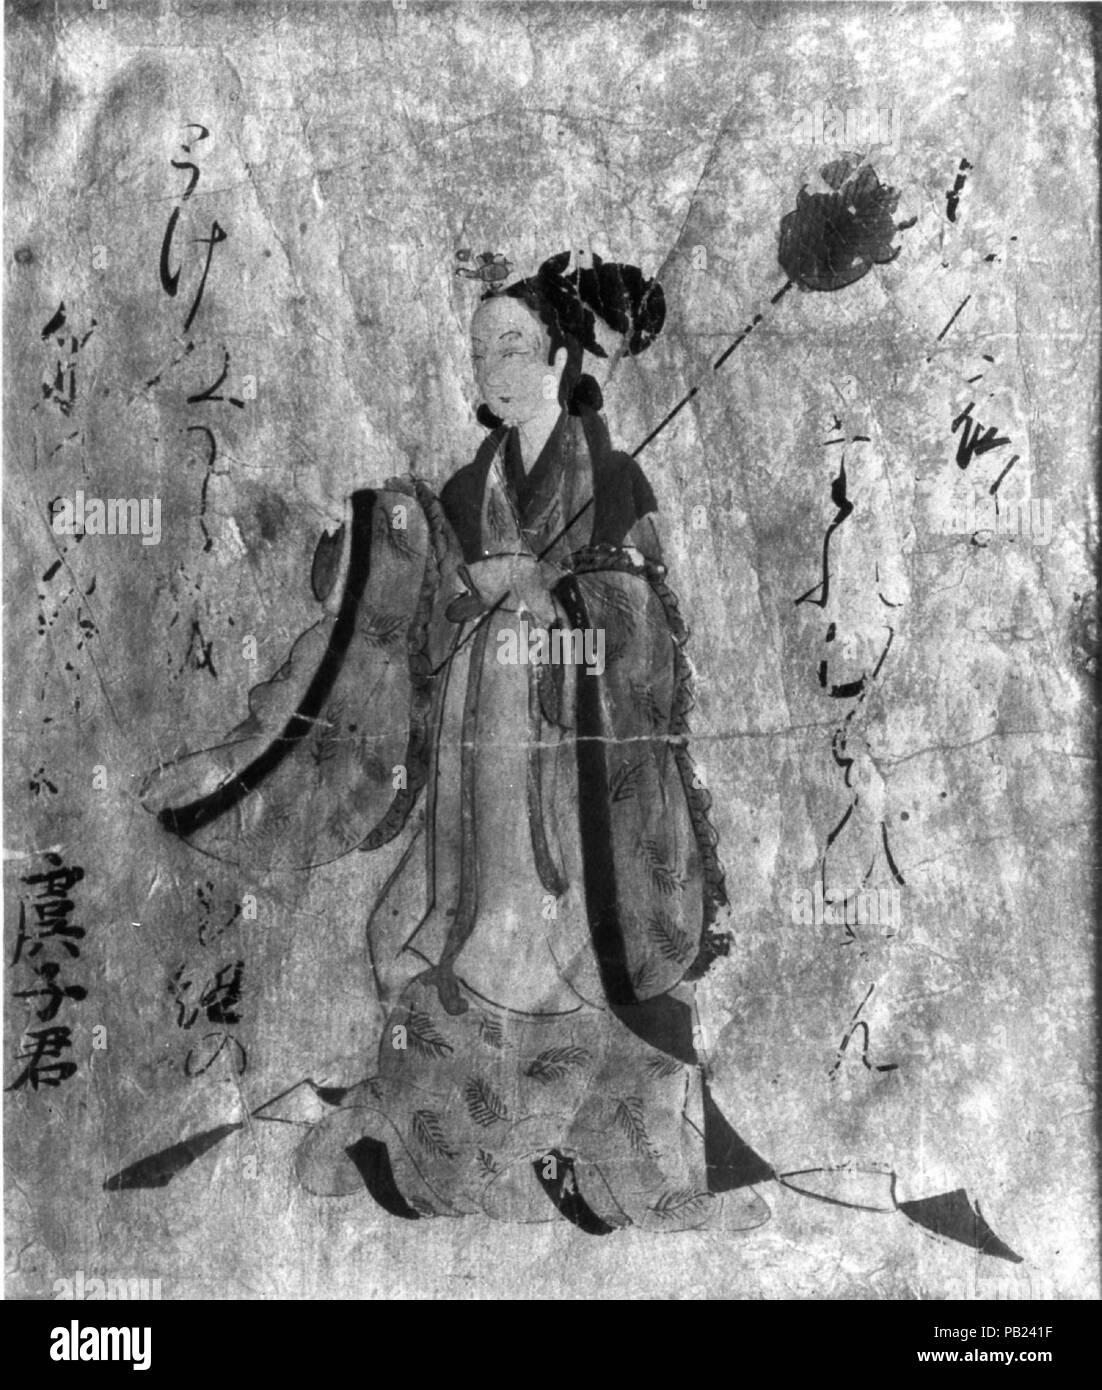 Lady, in der Tosa Stil. Kultur: Japan. Abmessungen: 7 3/4 x 5 5/8 in. (19,7 x 14,3 cm). Datum: 18. Museum: Metropolitan Museum of Art, New York, USA. Stockbild